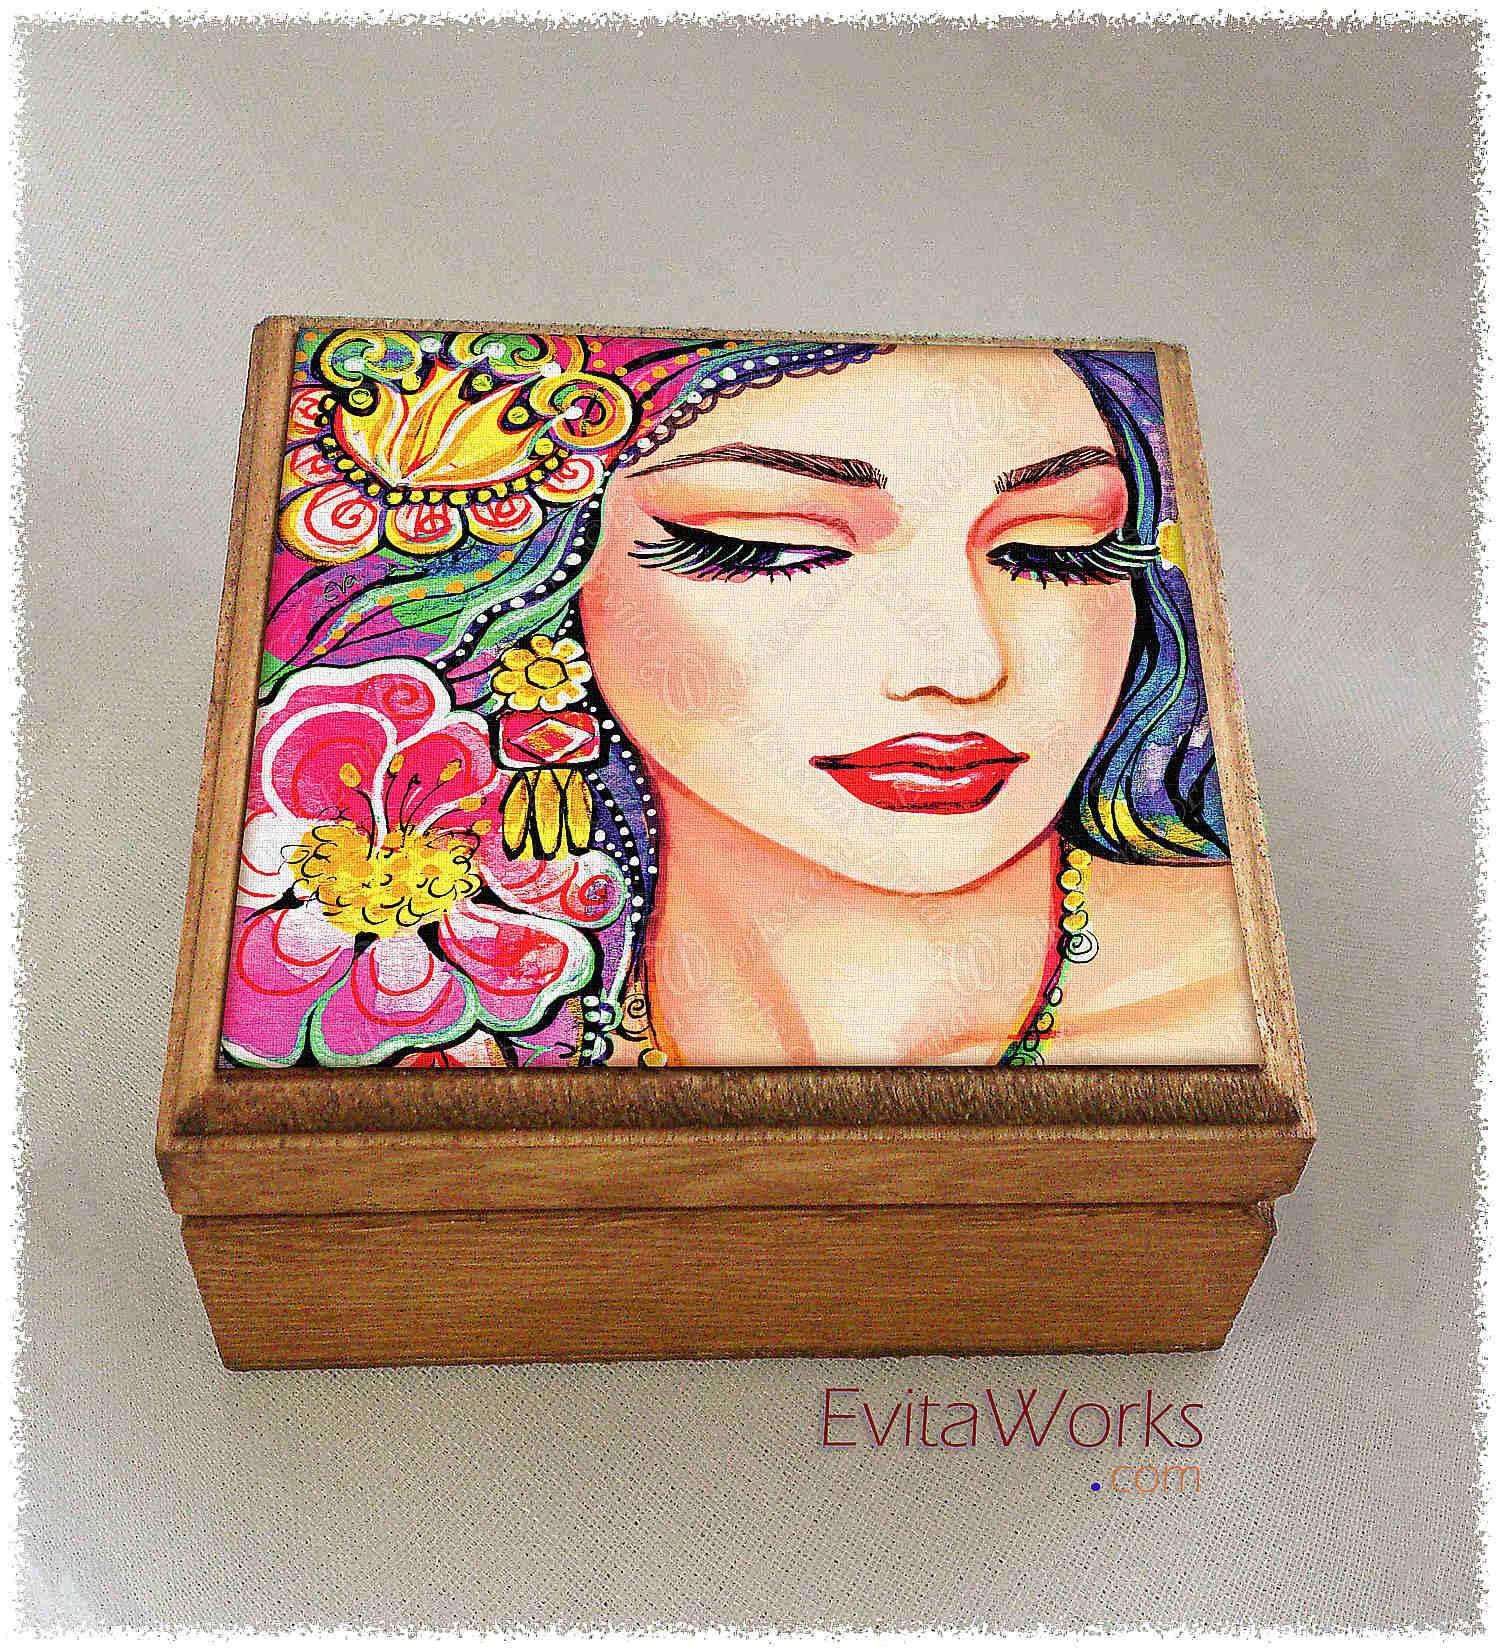 East Woman 21 Boxsq ~ EvitaWorks